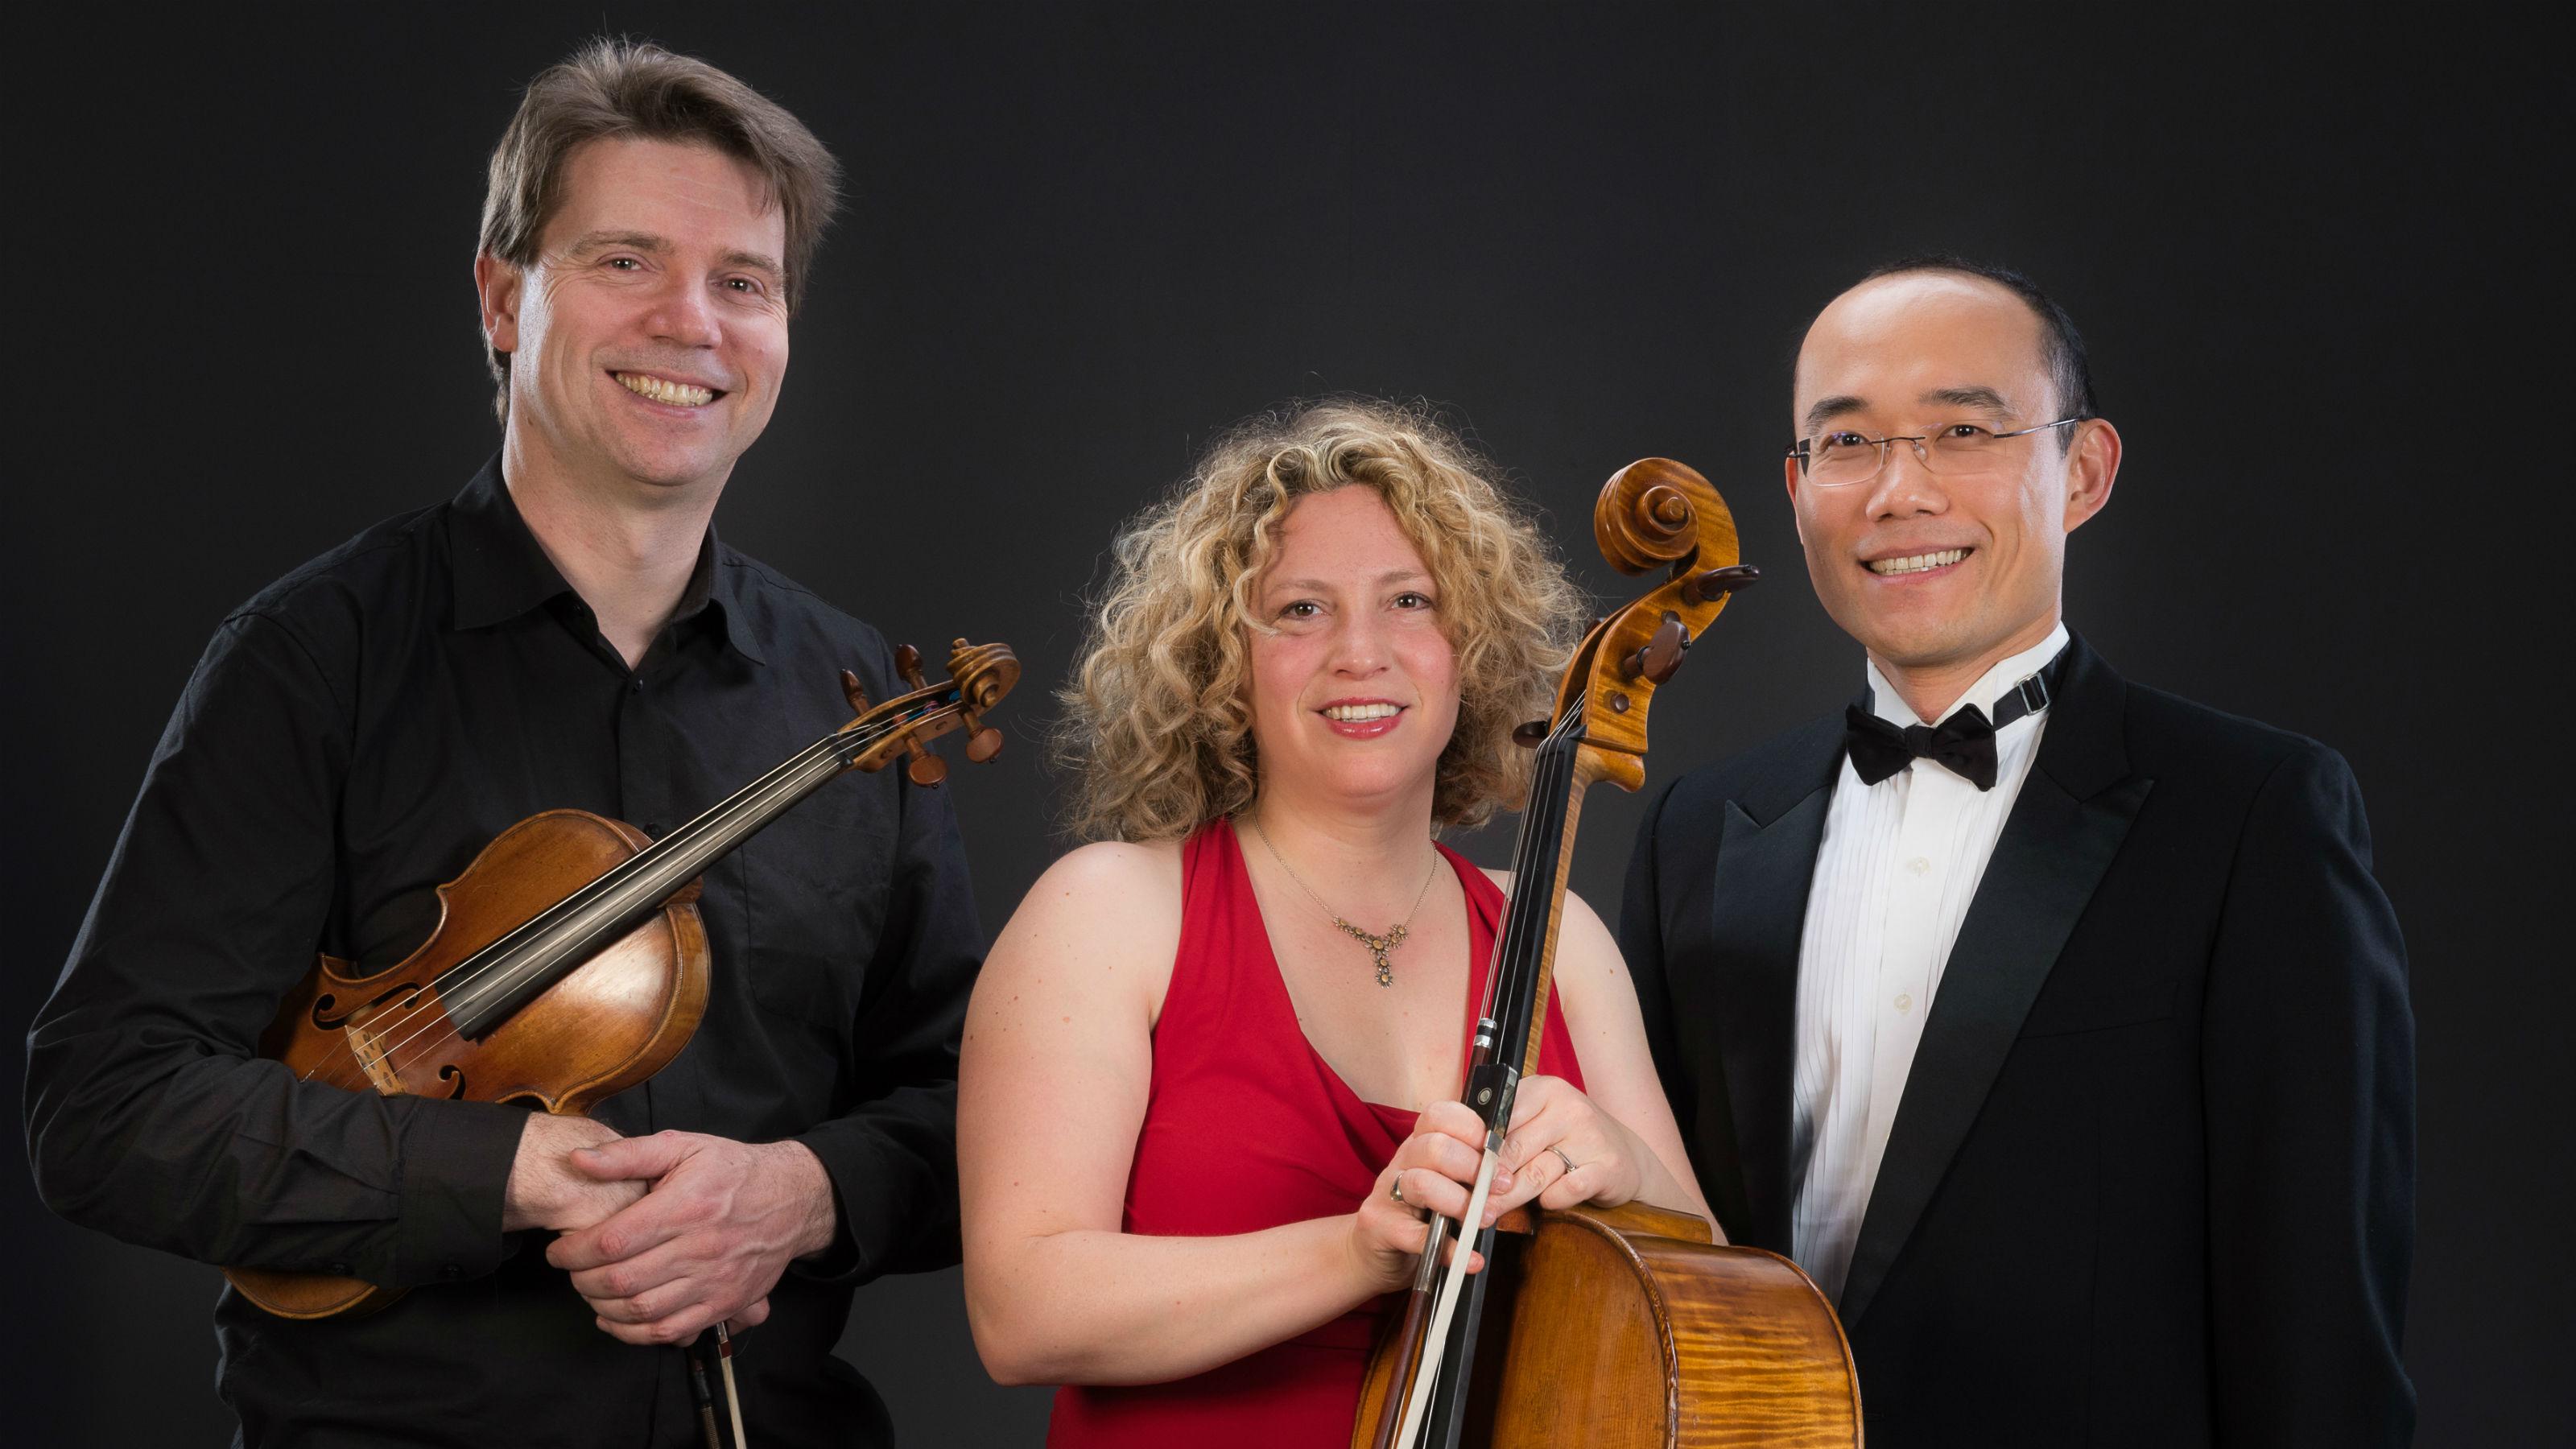 Te Kōkī Trio - Martin Riseley, Inbal Megiddo, Jian Liu